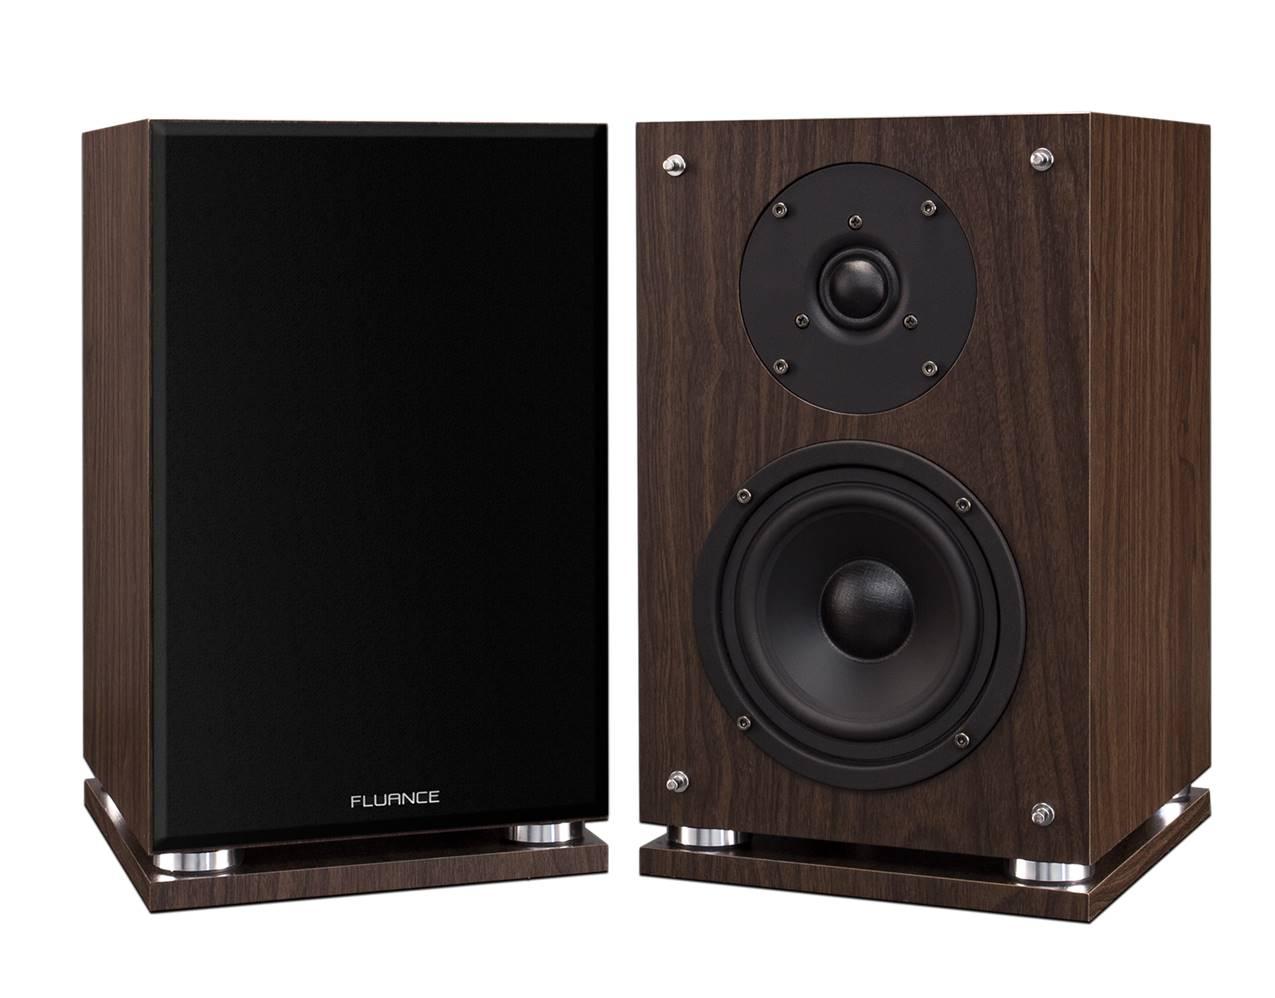 Fluance SX6W Vintage Speakers